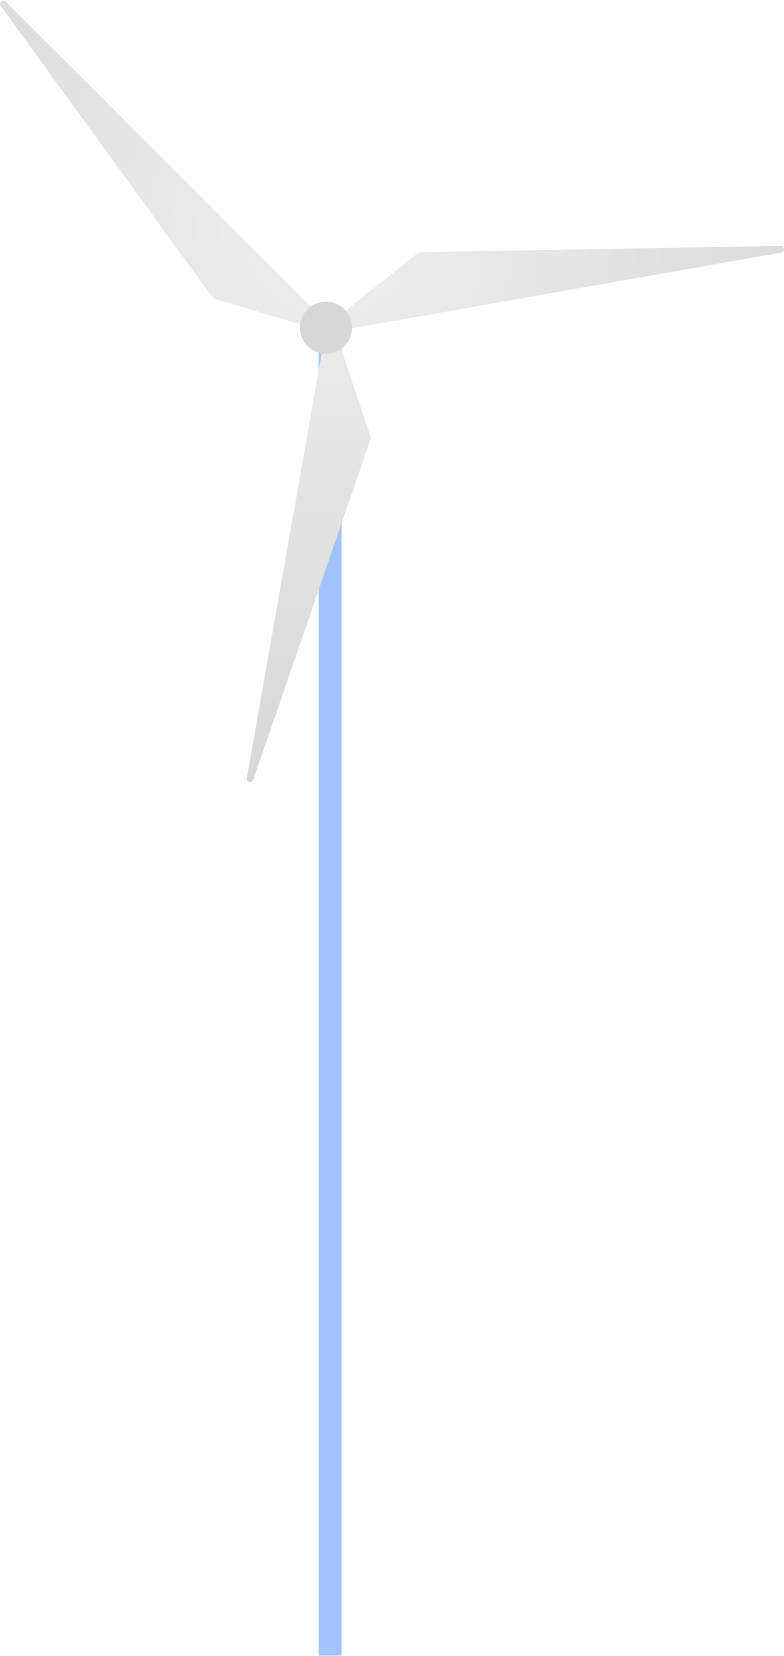 windmühle Clipart-Grafik als PNG, SVG